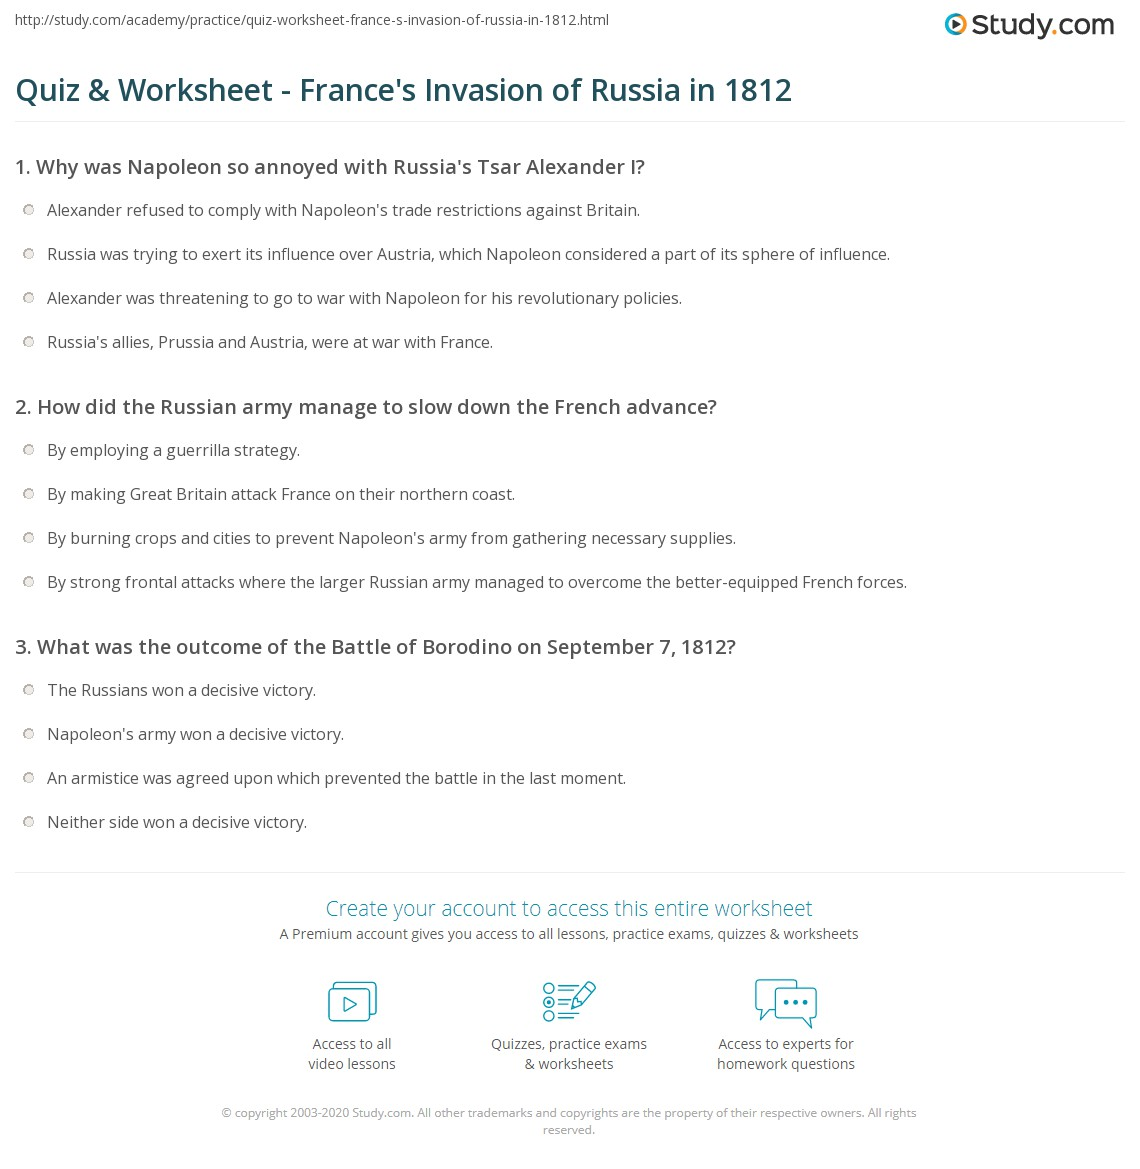 quiz worksheet france 39 s invasion of russia in 1812. Black Bedroom Furniture Sets. Home Design Ideas